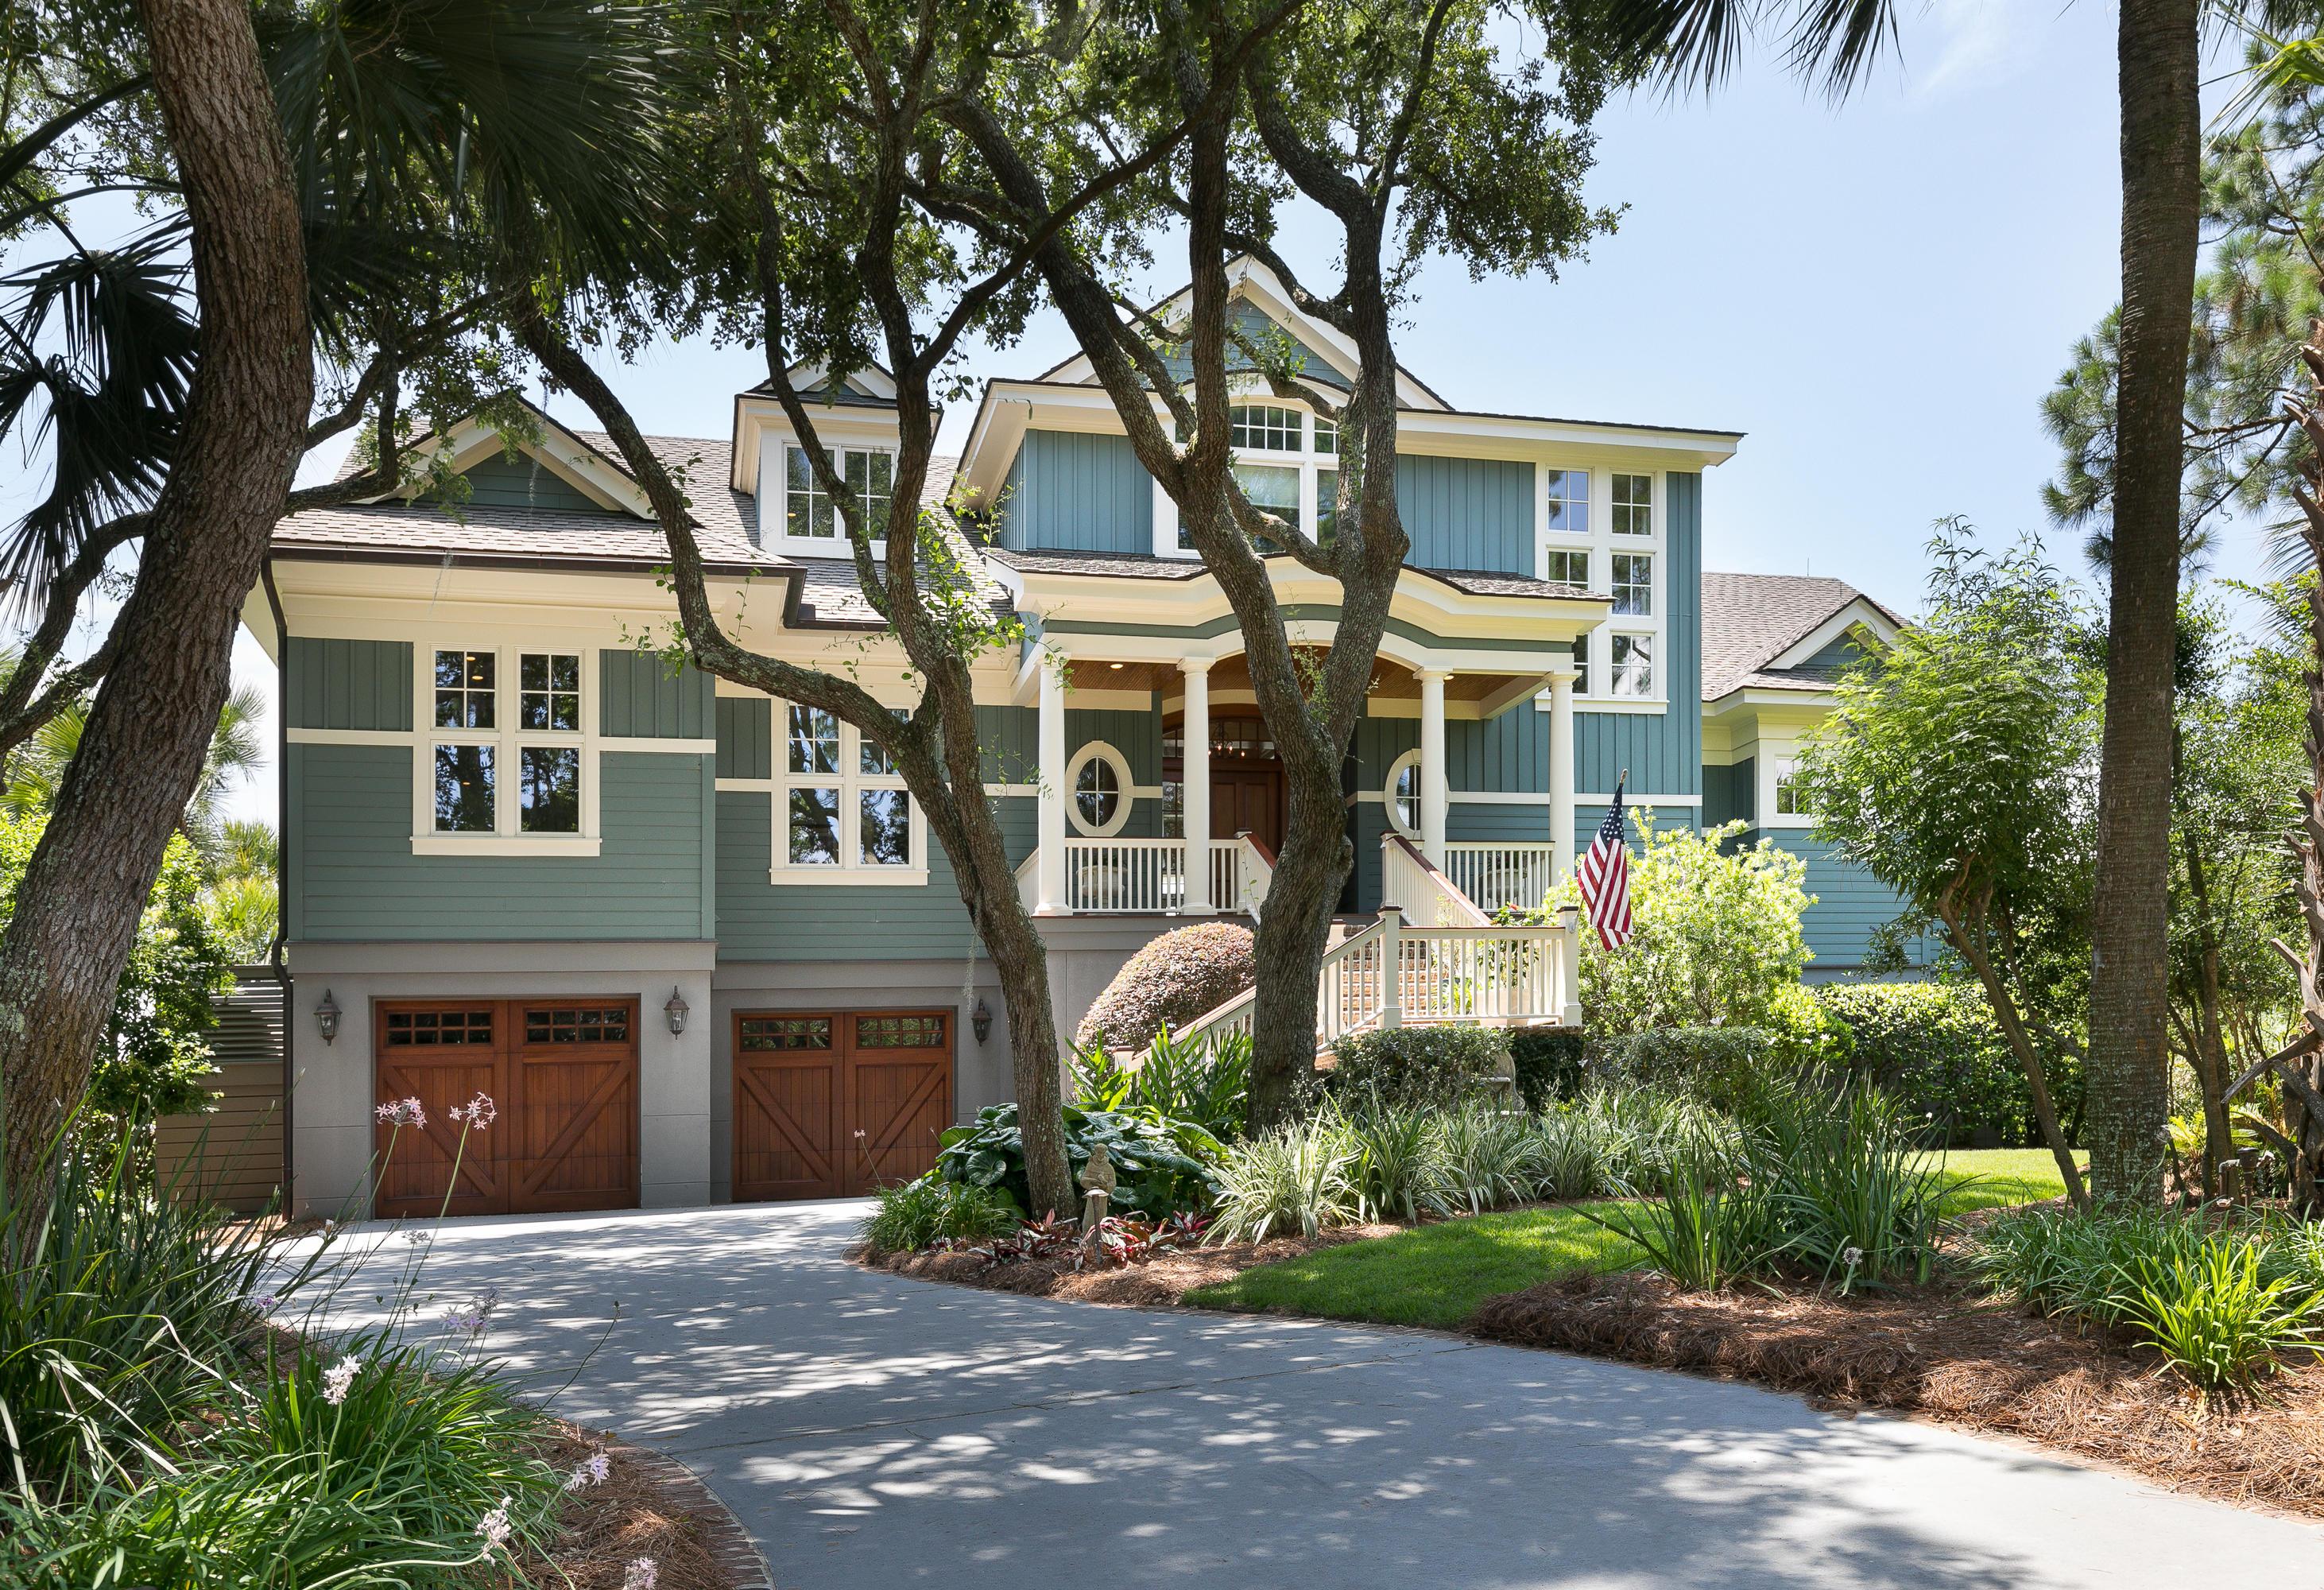 Seabrook Island Homes For Sale - 3033 Marshgate, Johns Island, SC - 12